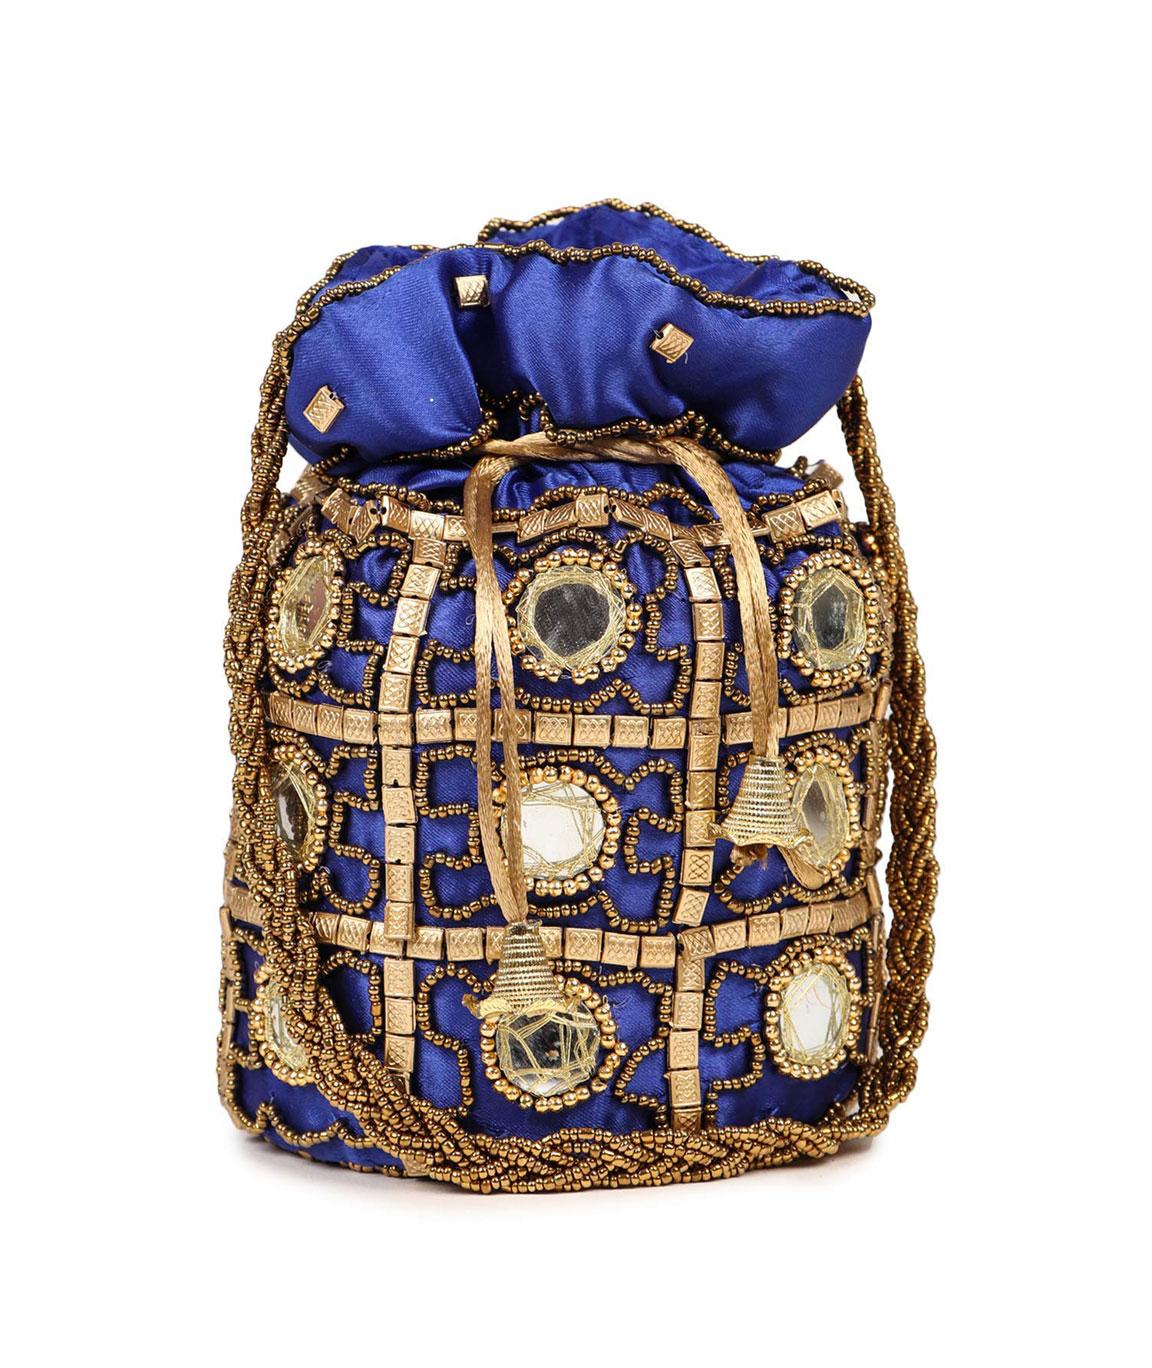 DN Enterprises Womens Ethnic Silk Potli Bag/Potli Purse/Bridal Wristlet, Gift for Her(blue)